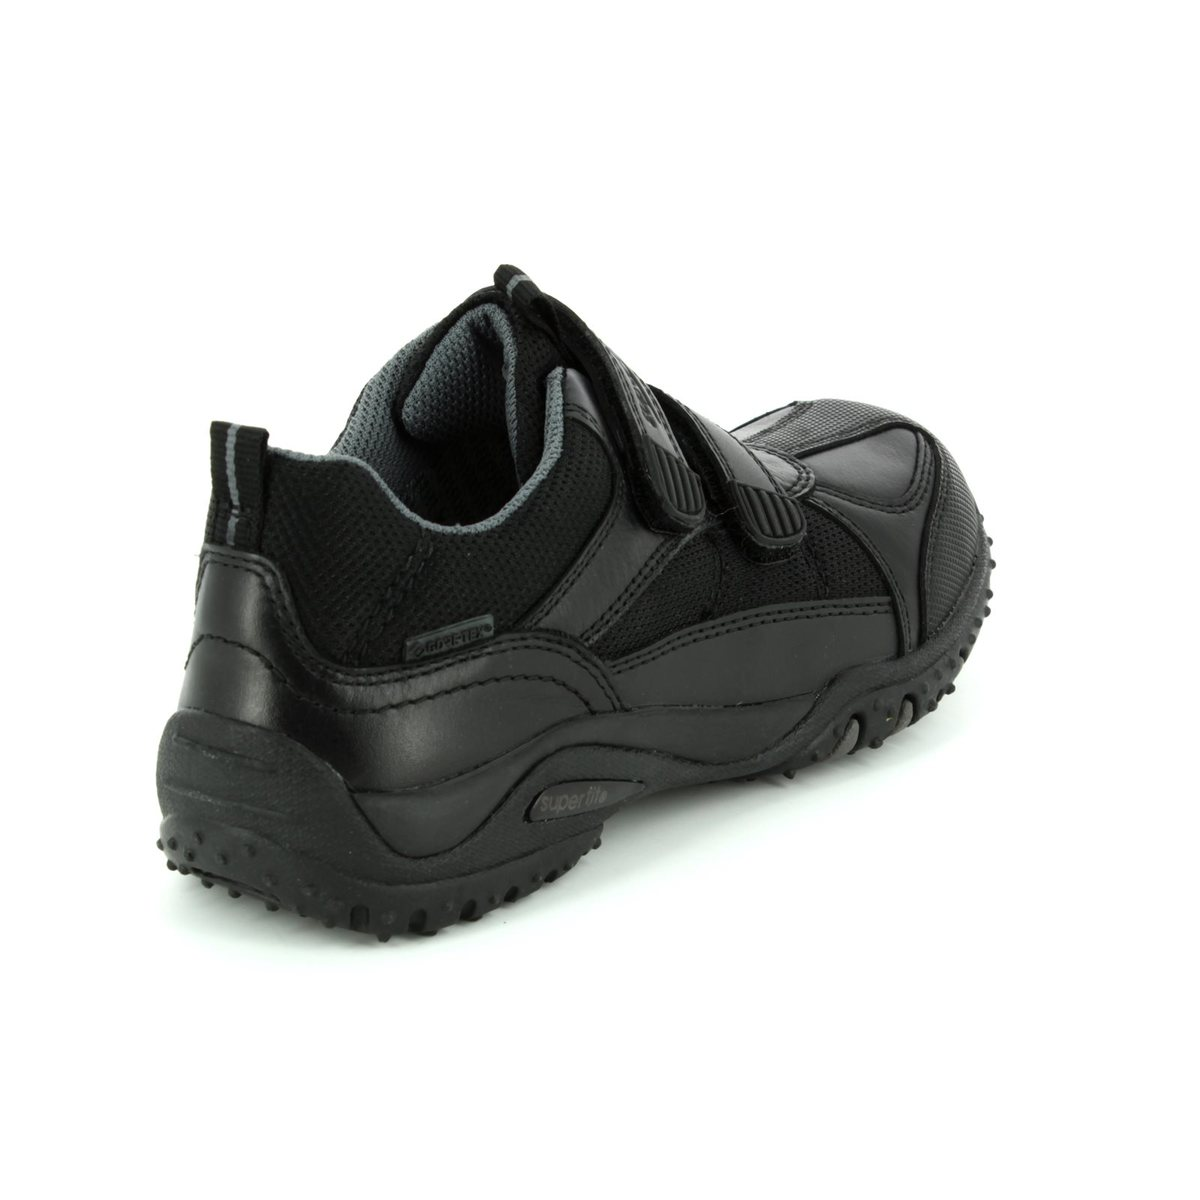 6faaa19a610 Superfit Everyday Shoes - Black - 08361/01 JOE GORE TEX